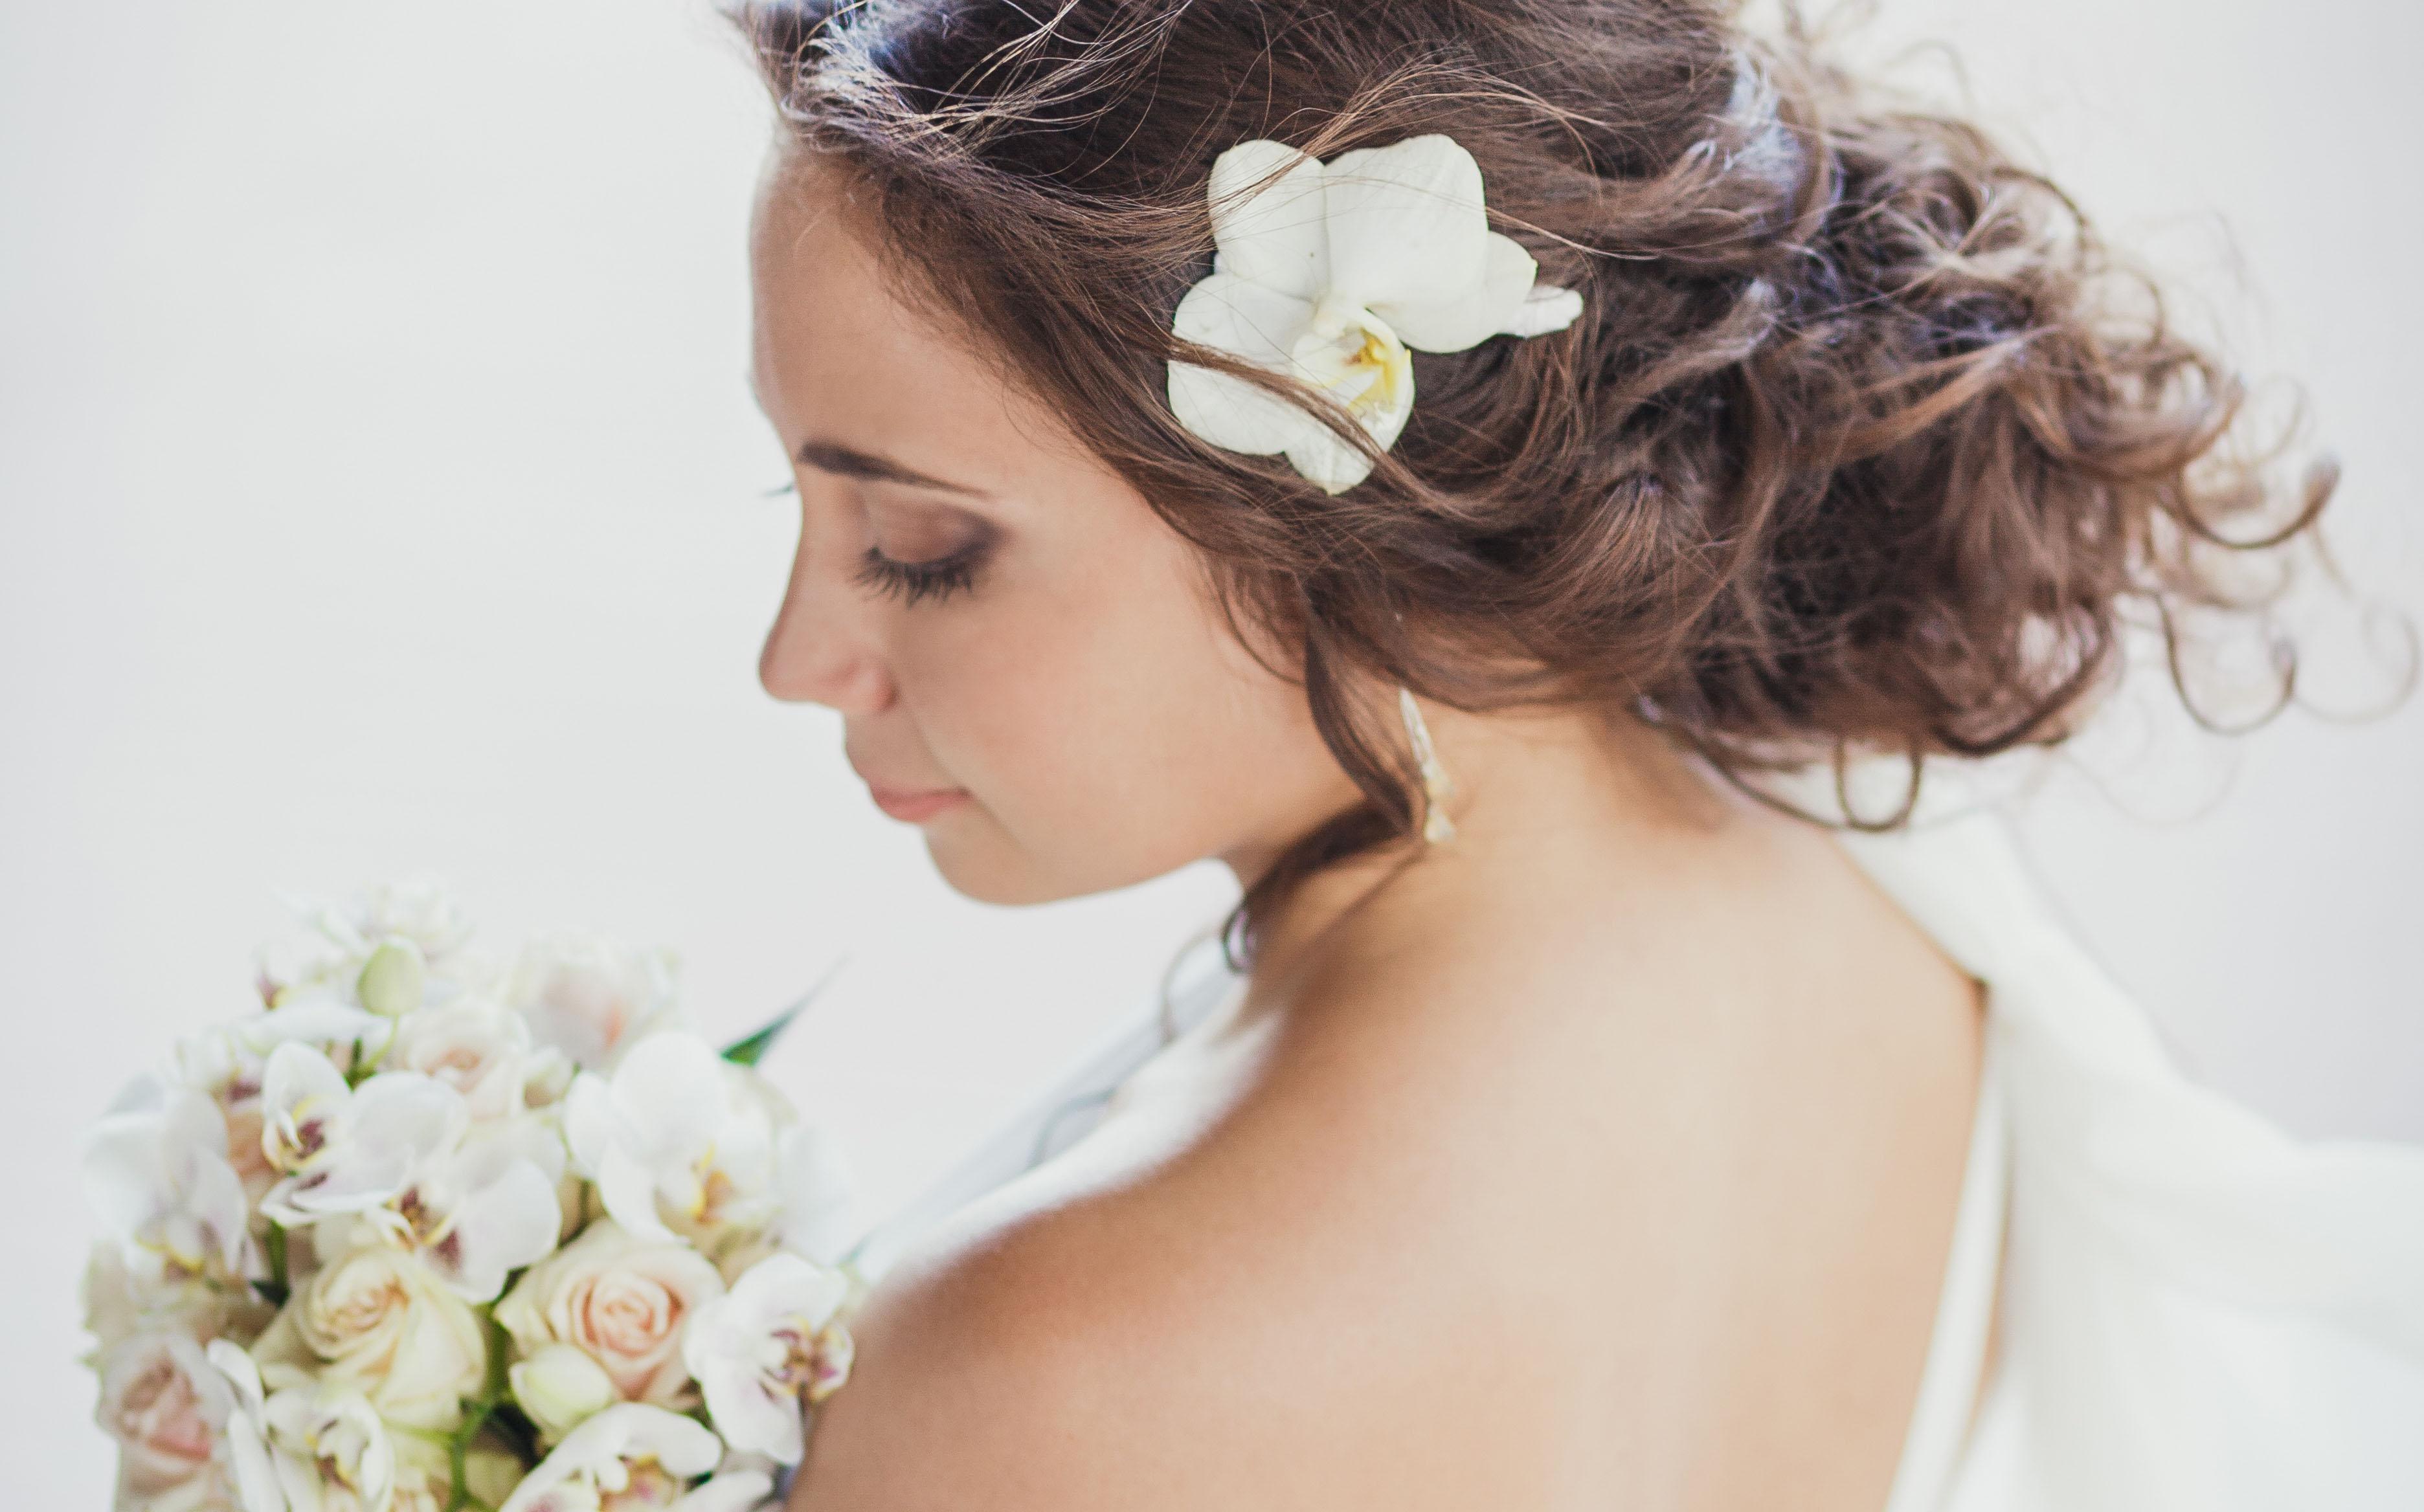 Le piu belle acconciature sposa